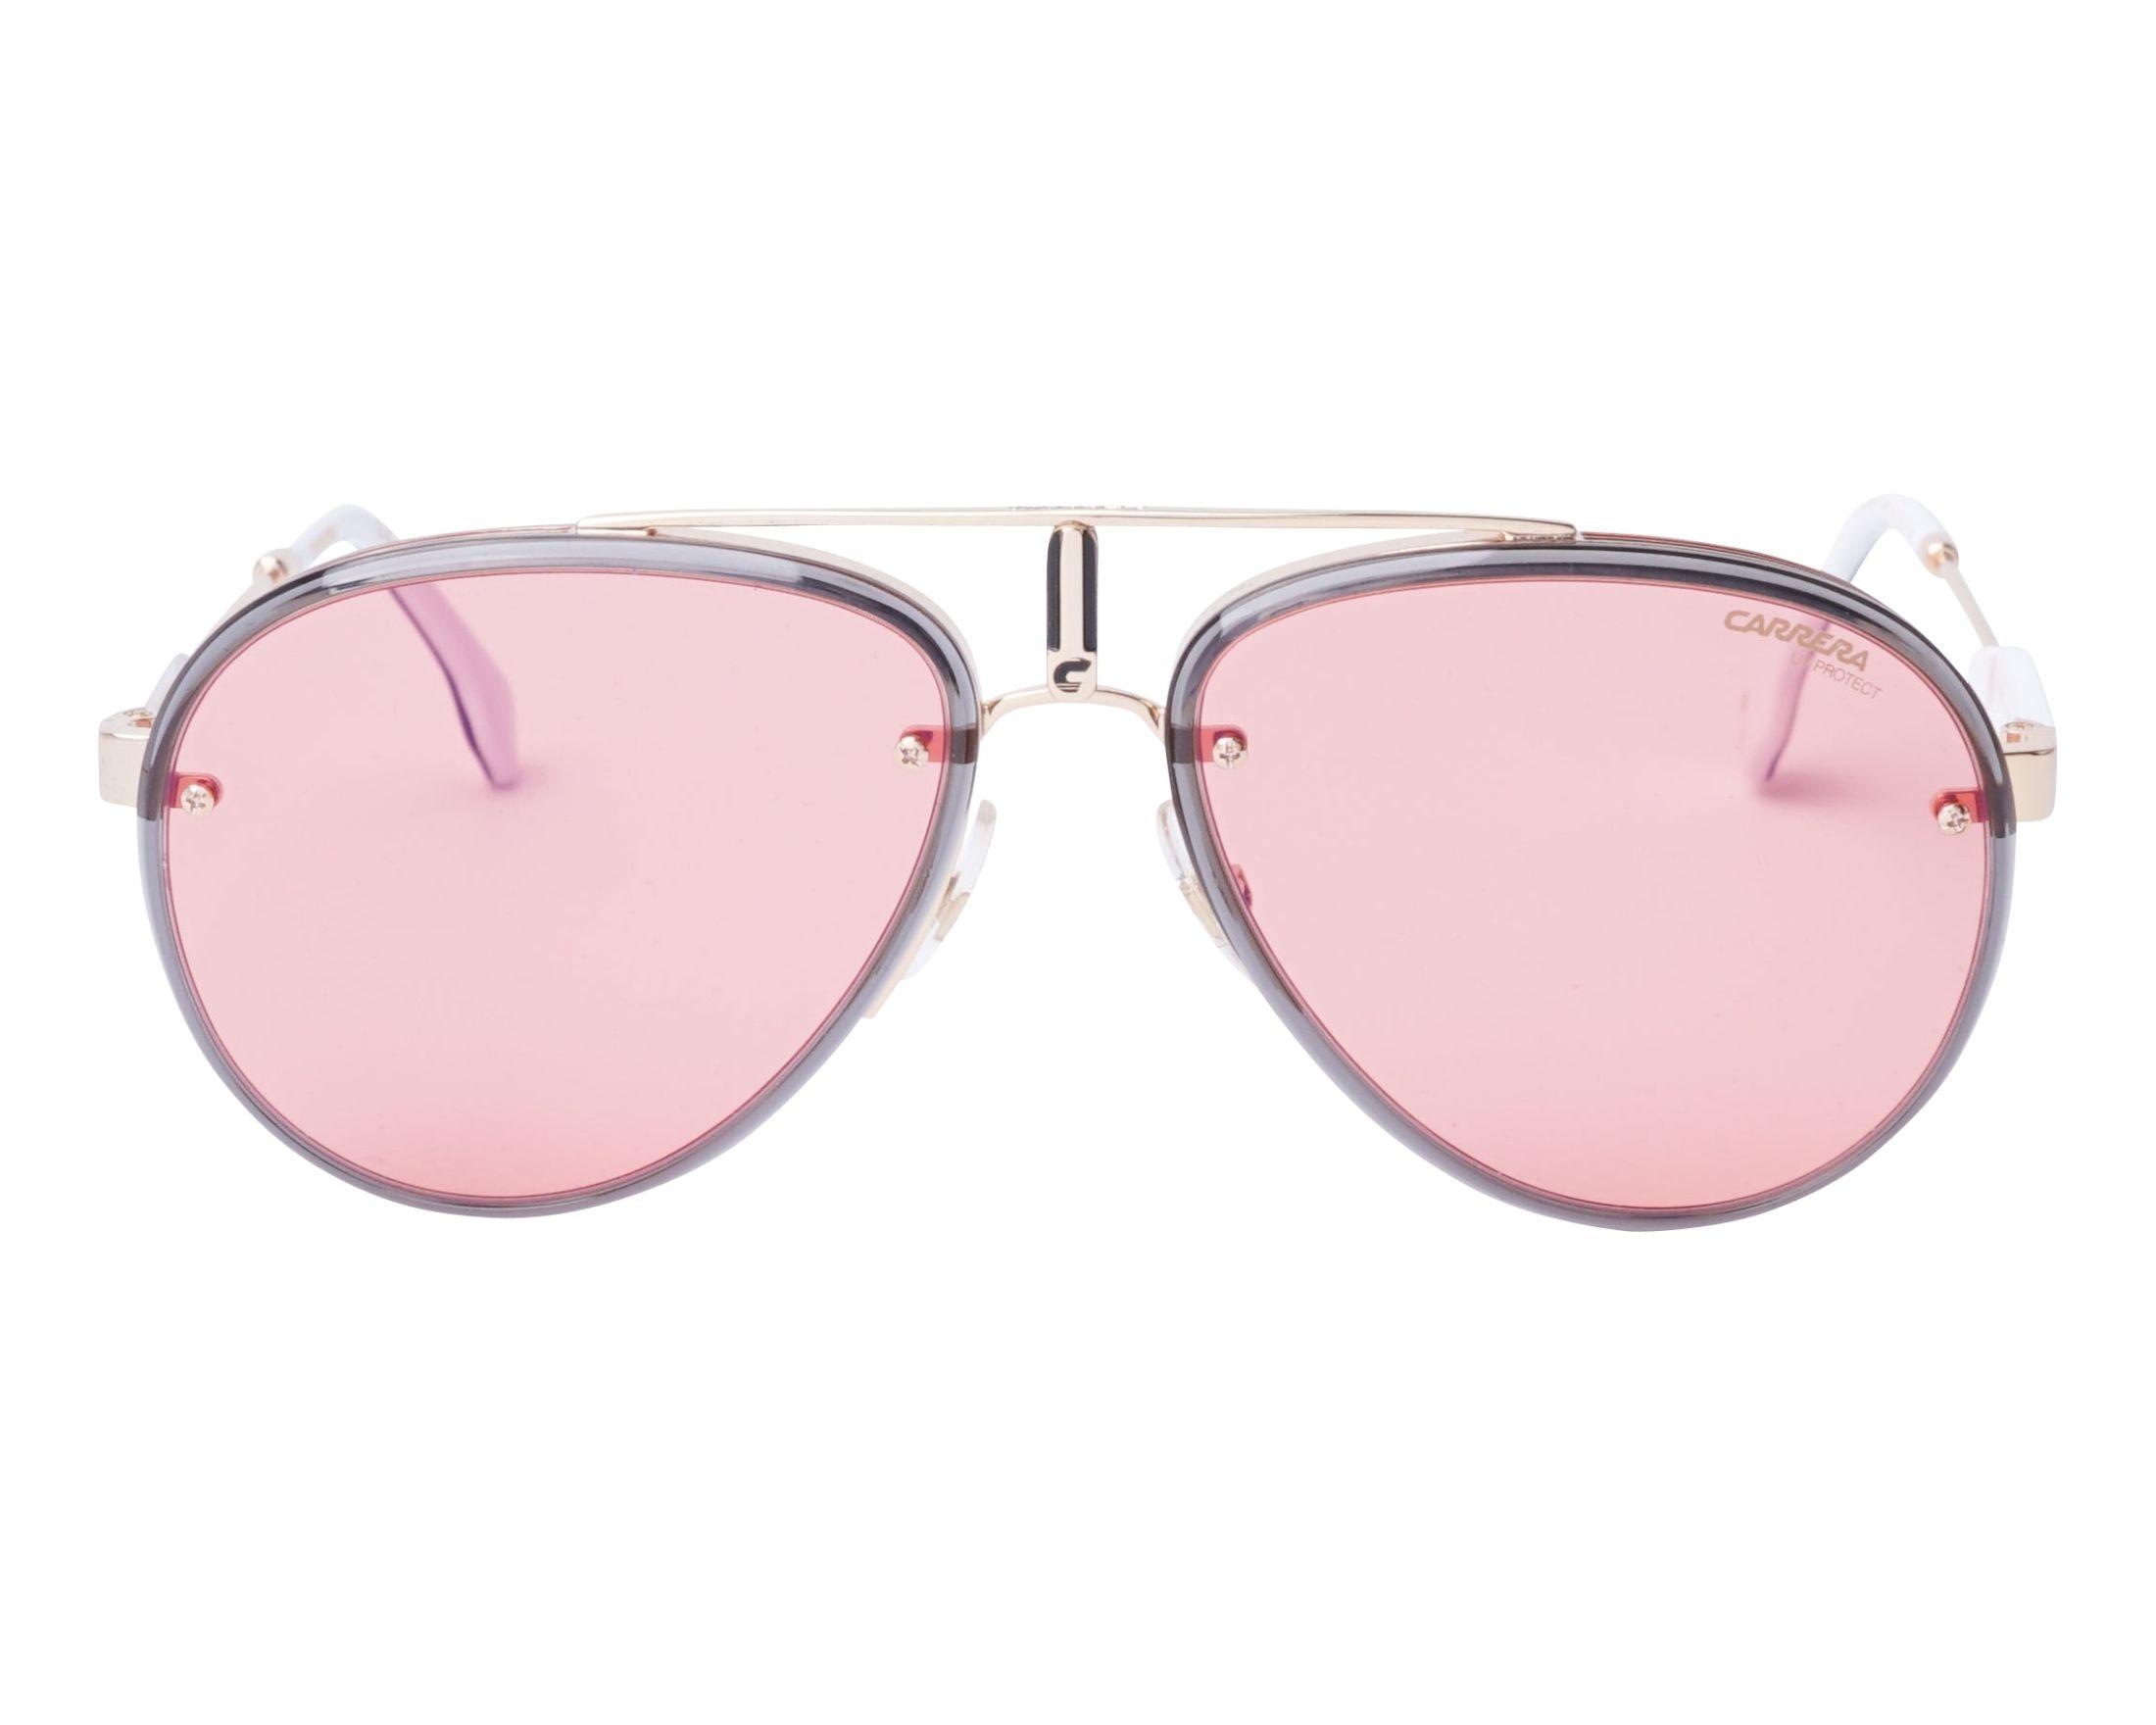 b43856d06f Sunglasses Carrera GLORY Y11UZ 58-17 Gold Grey front view